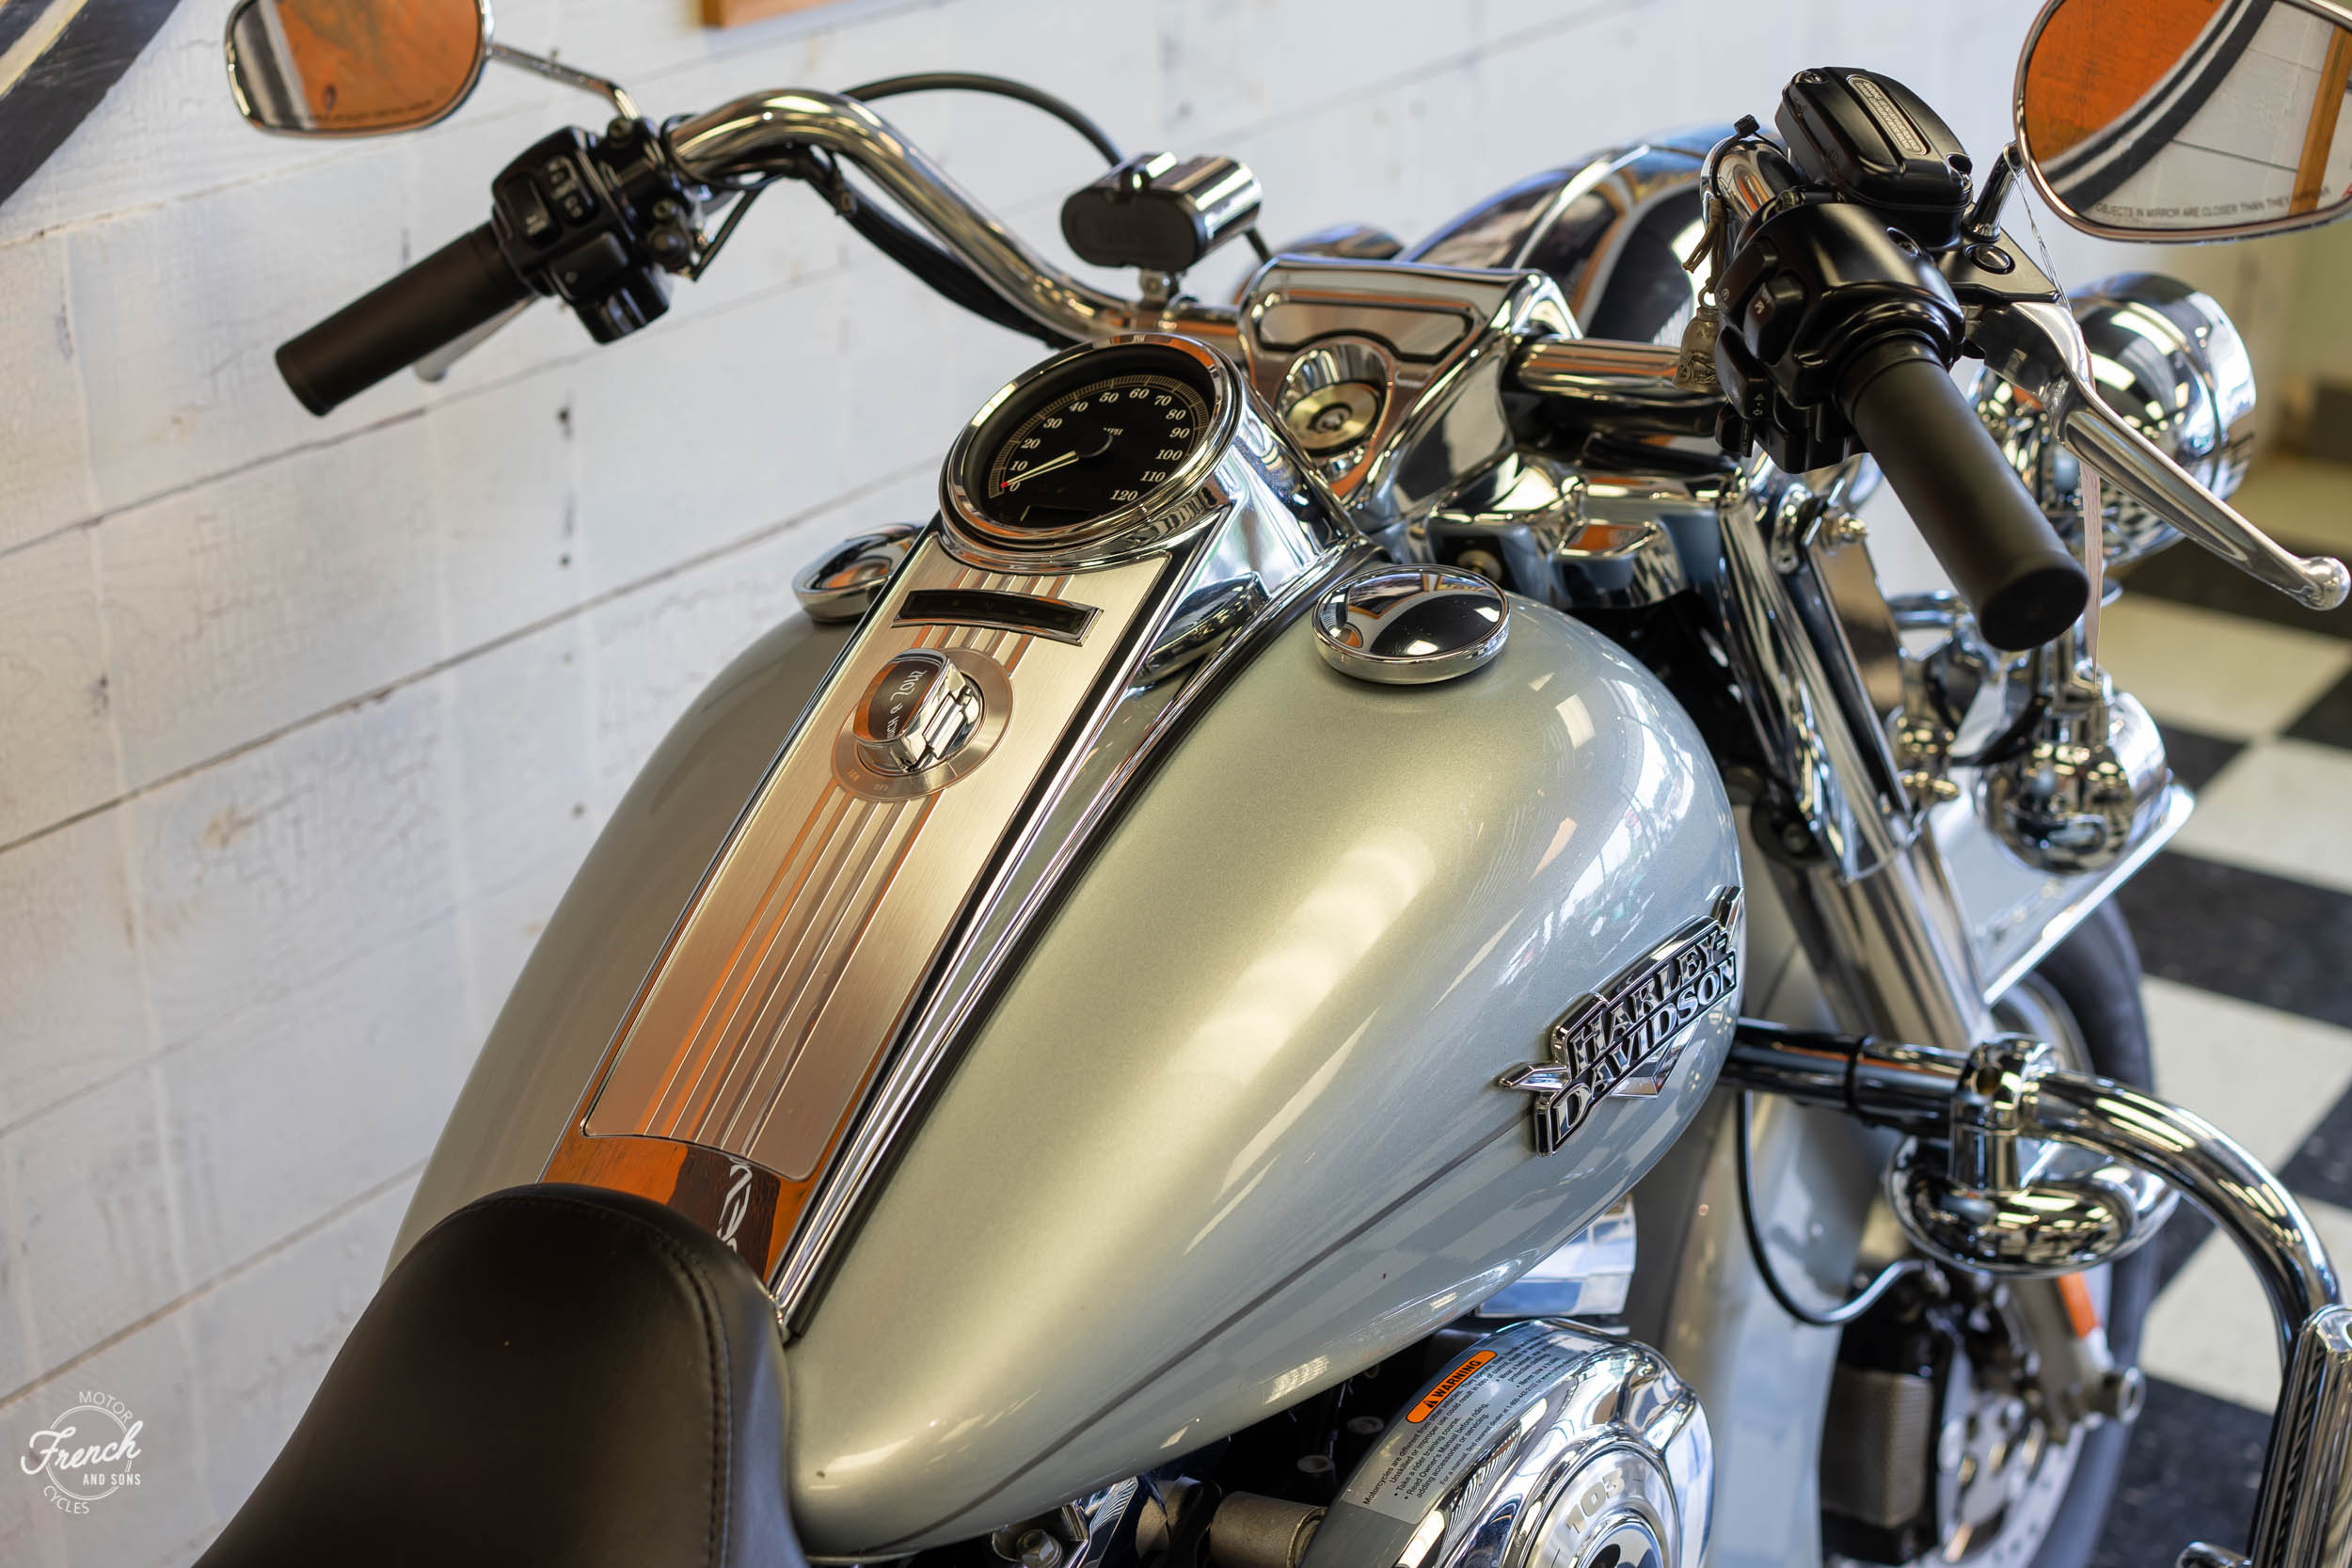 2011_Harley_davidson_road_king_silver-11.jpg